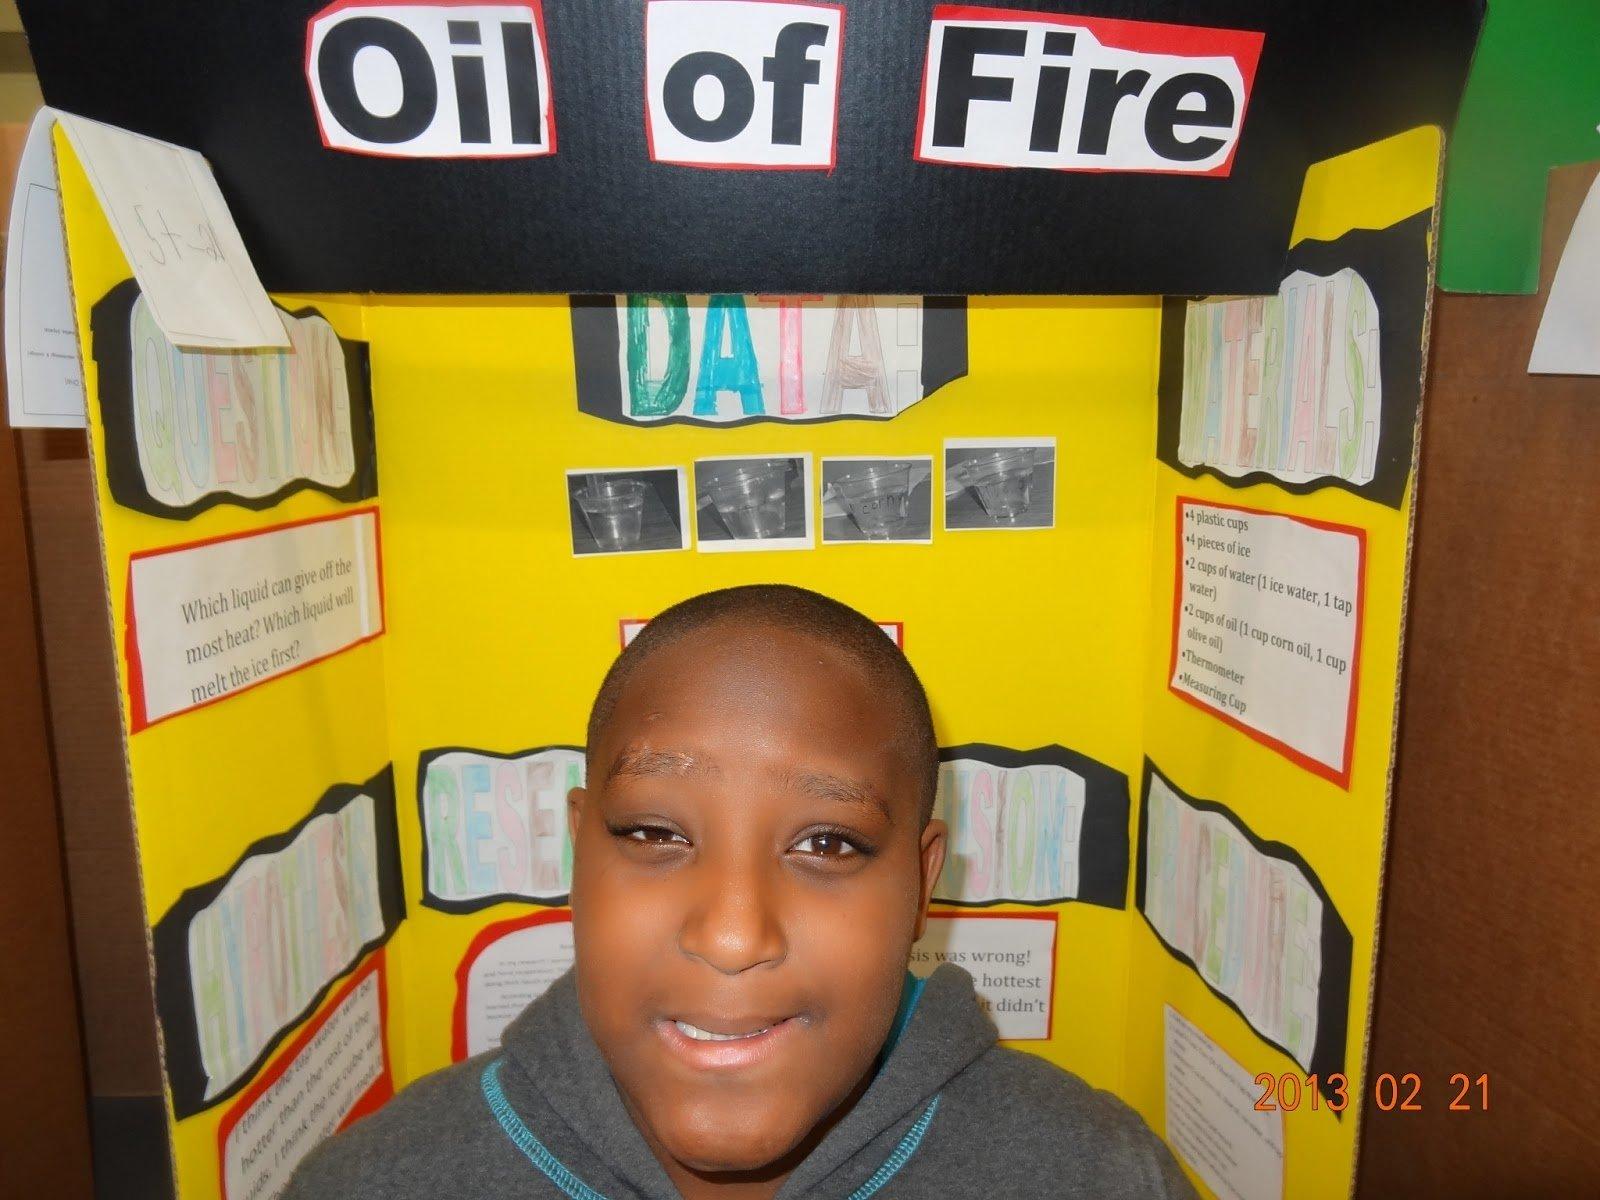 10 Best 6 Grade Science Fair Ideas nokw woodwork 5th grade 8th grade science fair projects info 39 2020